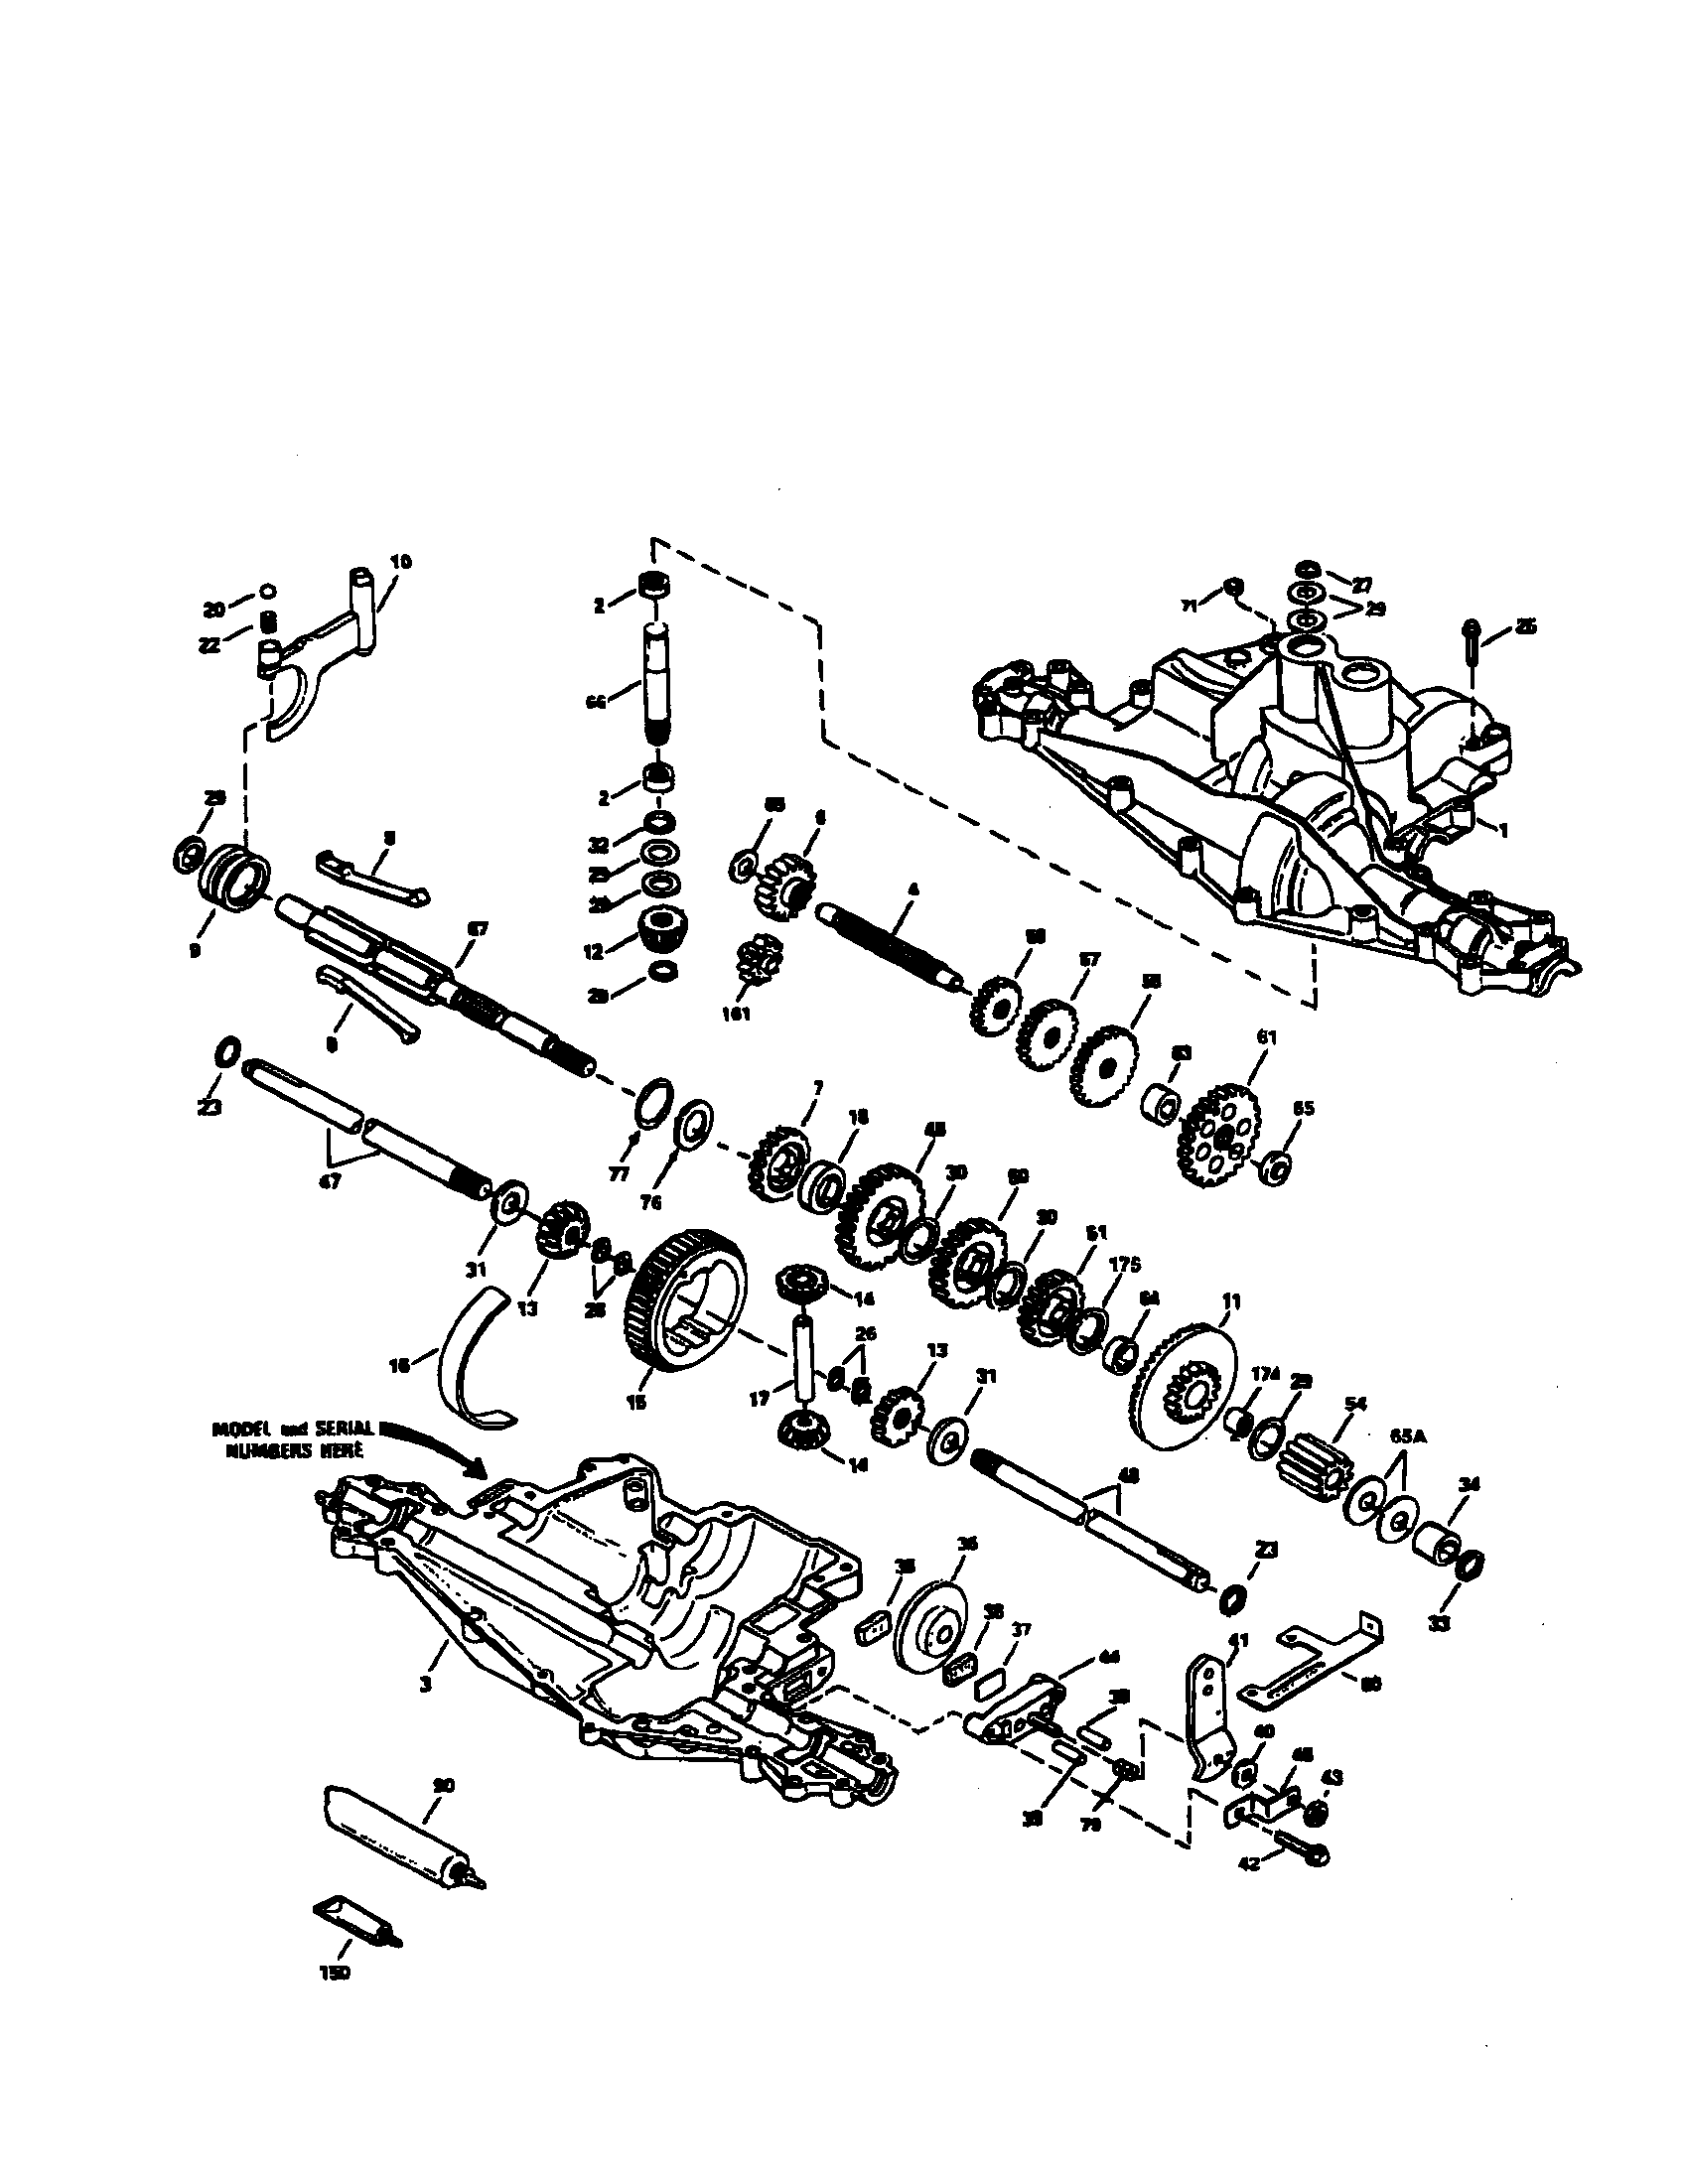 Craftsman Gt5000 Belt Routing Diagram